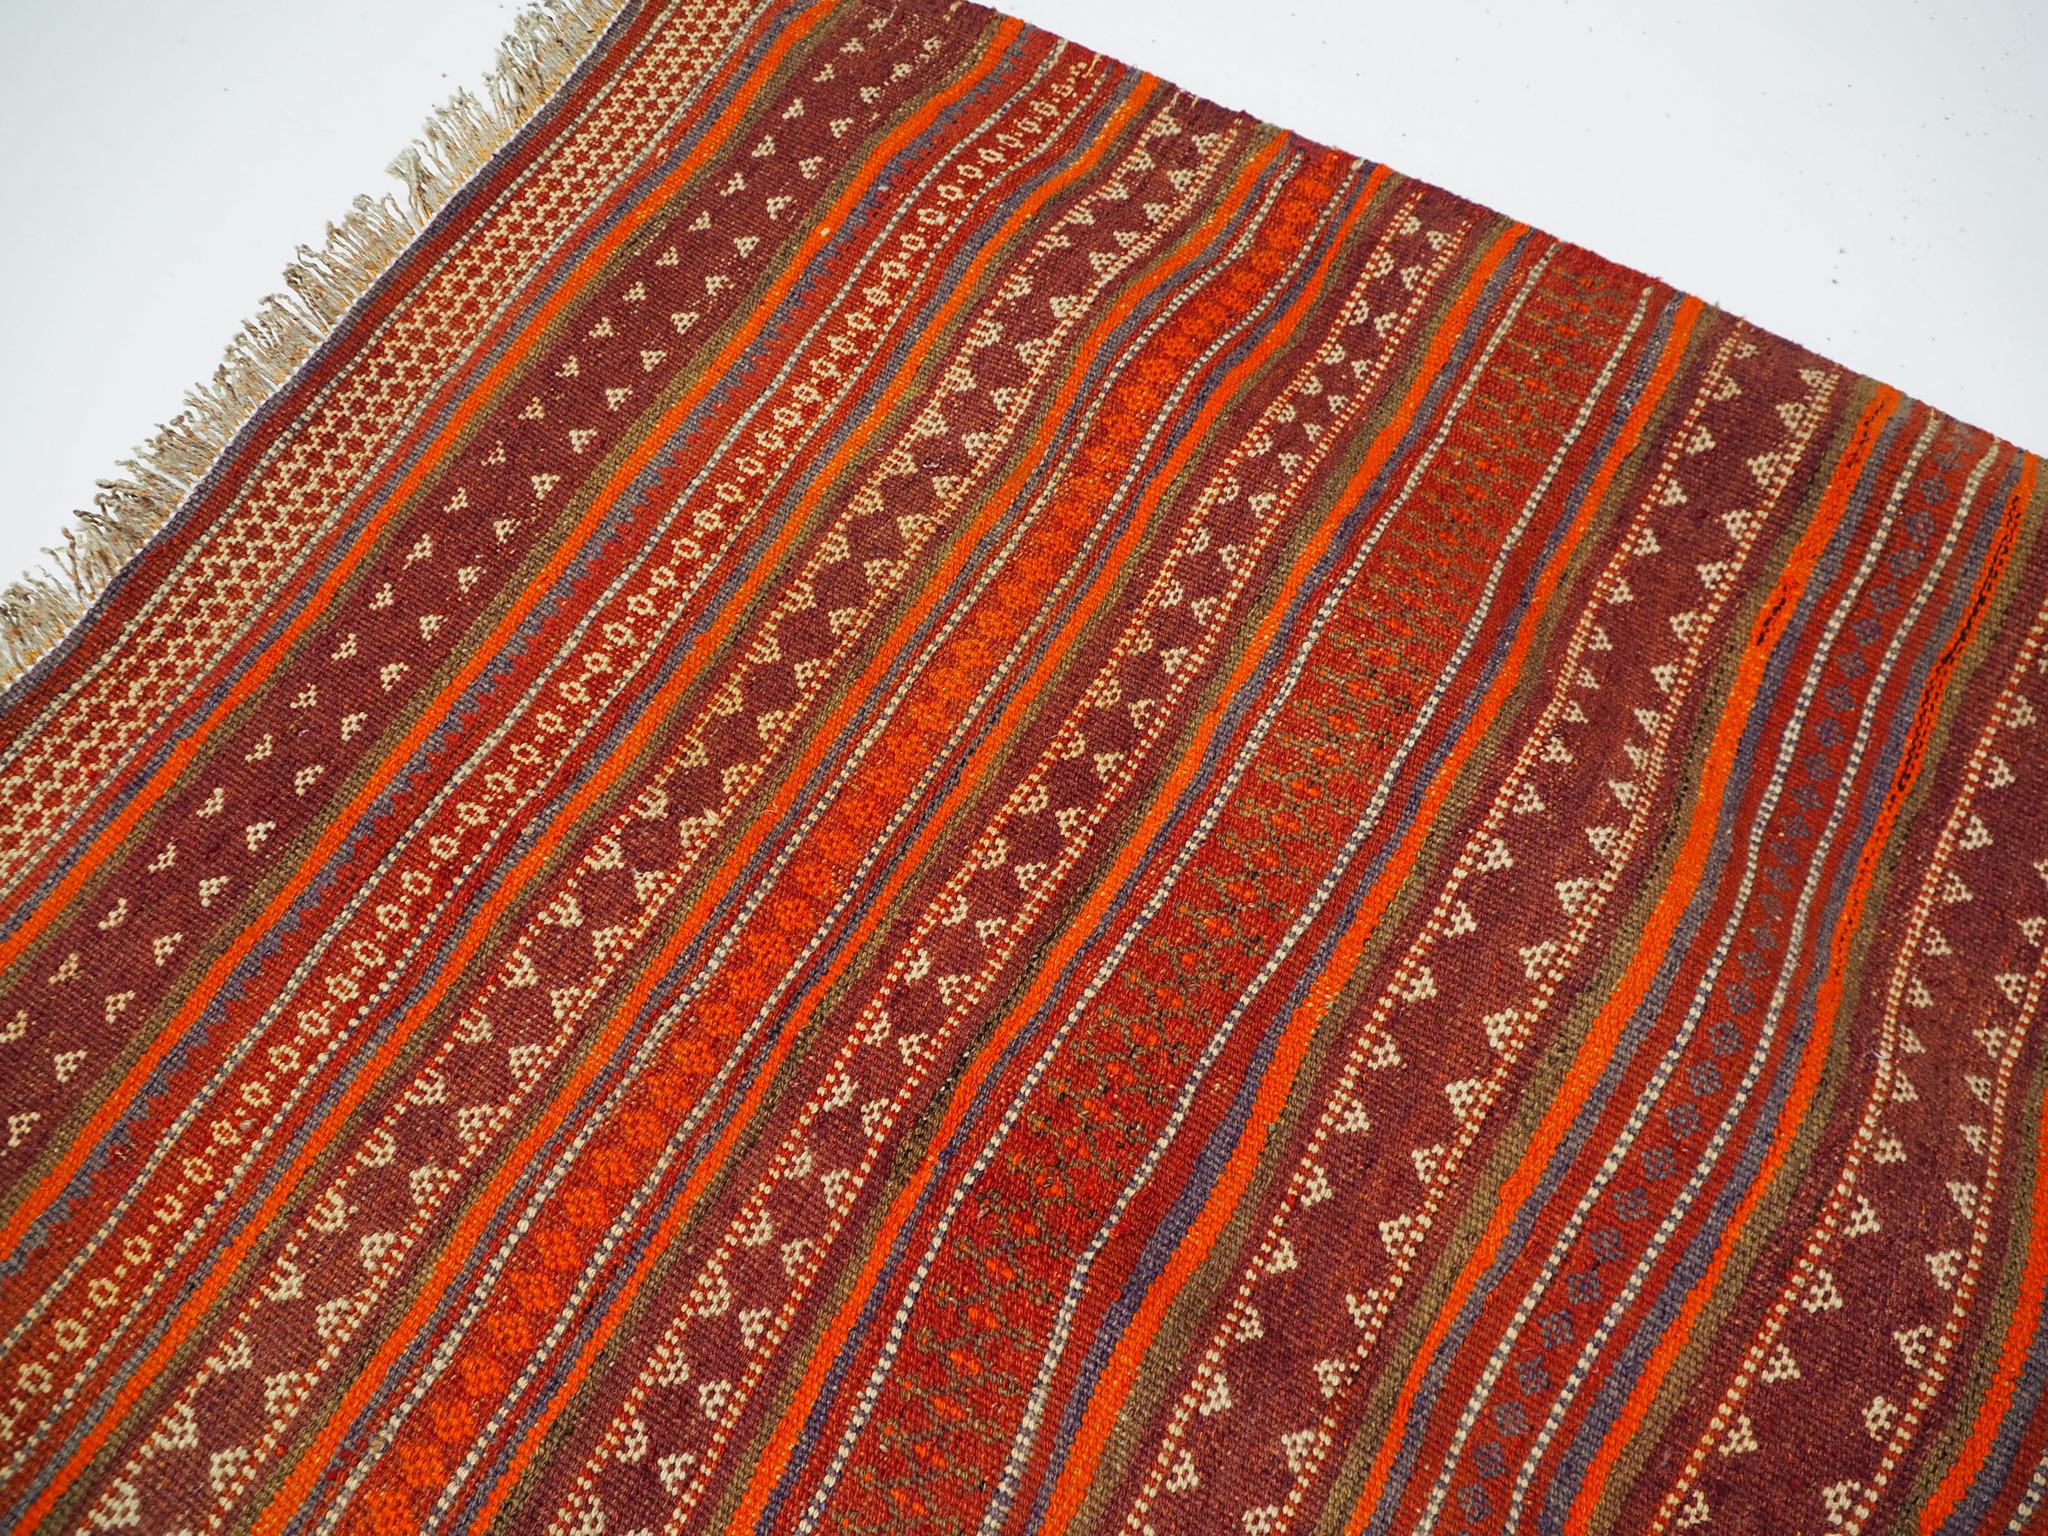 260x115 cm Antik orient handgewebte Teppich Nomaden Baluch sumakh kelim afghan Beloch kilim Nr-PK387